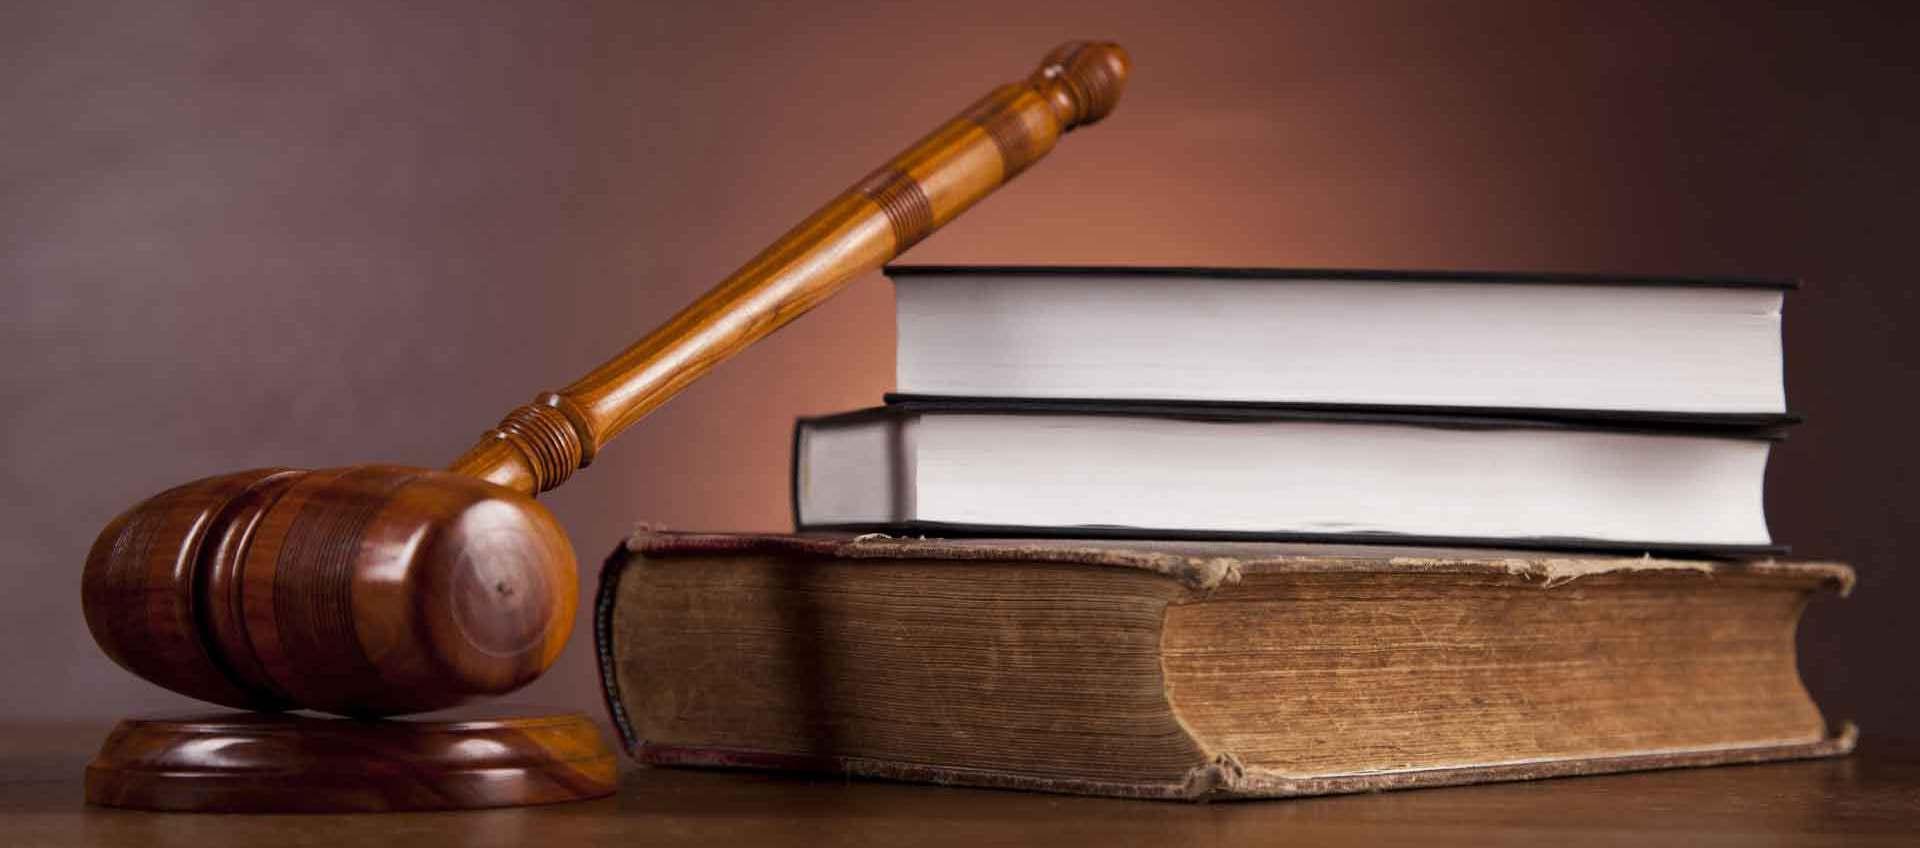 Law Firm in Foley, AL